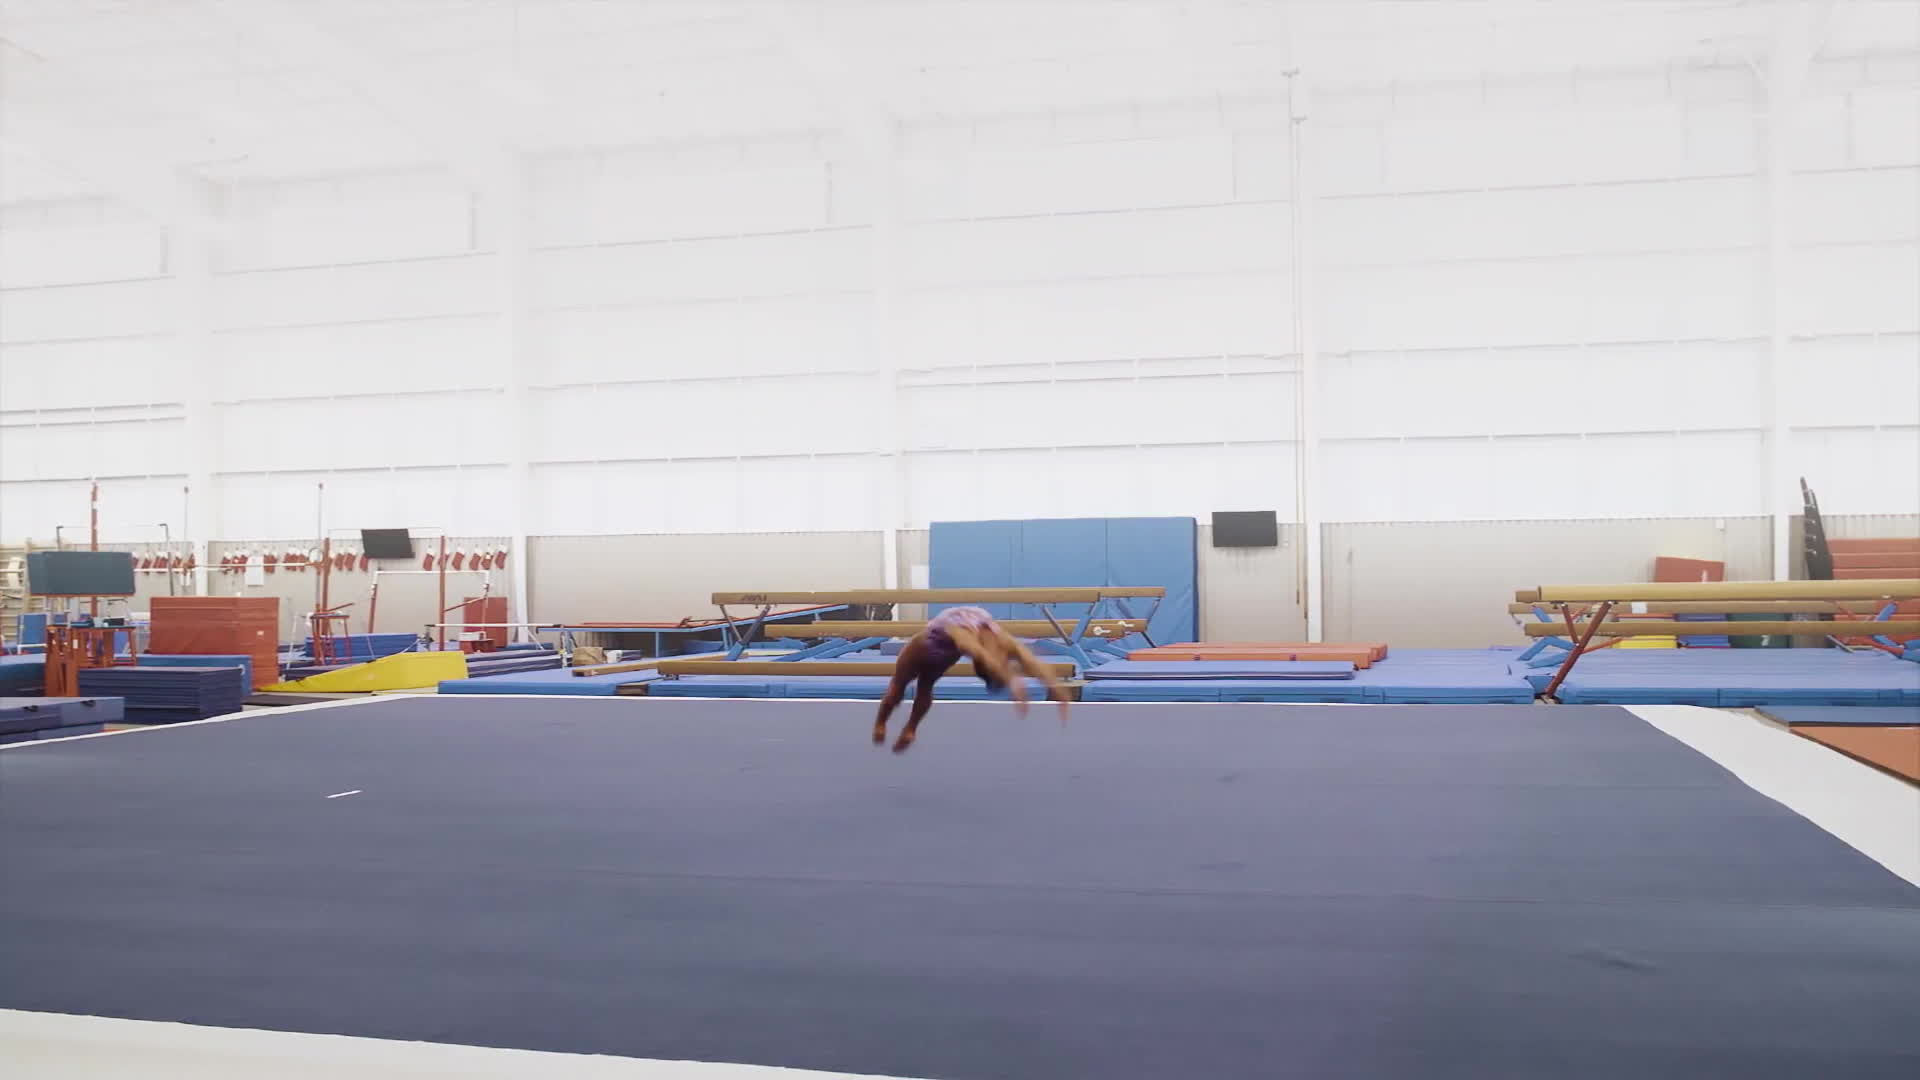 gymnast, gymnastics, new york times, newyorktimes, simone biles, simonebiles, The Fine Line: What Makes Simone Biles the Worlds Best Gymnast GIFs